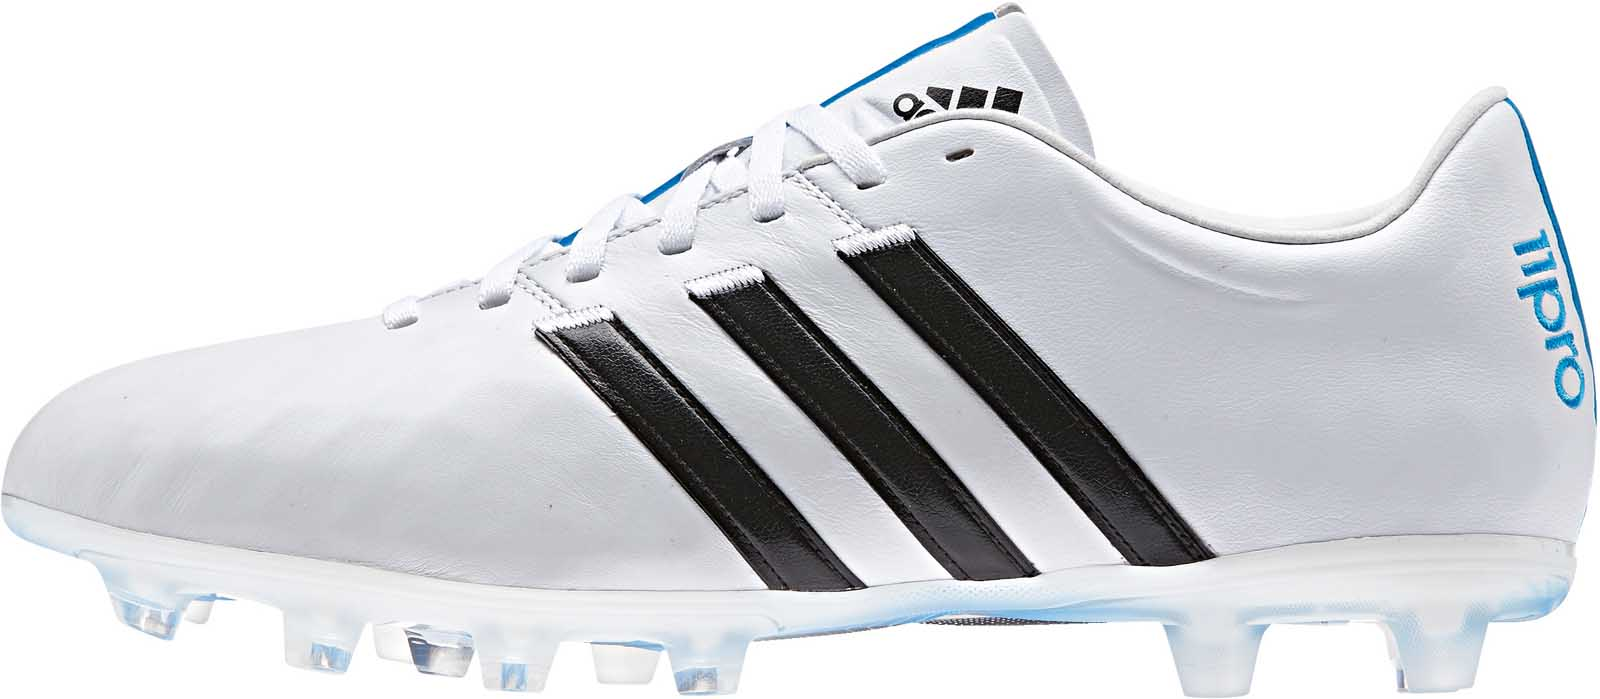 promo code 02dc7 b91d0 11 pro adidas Adidas Adipure 11pro White Black Blue ...